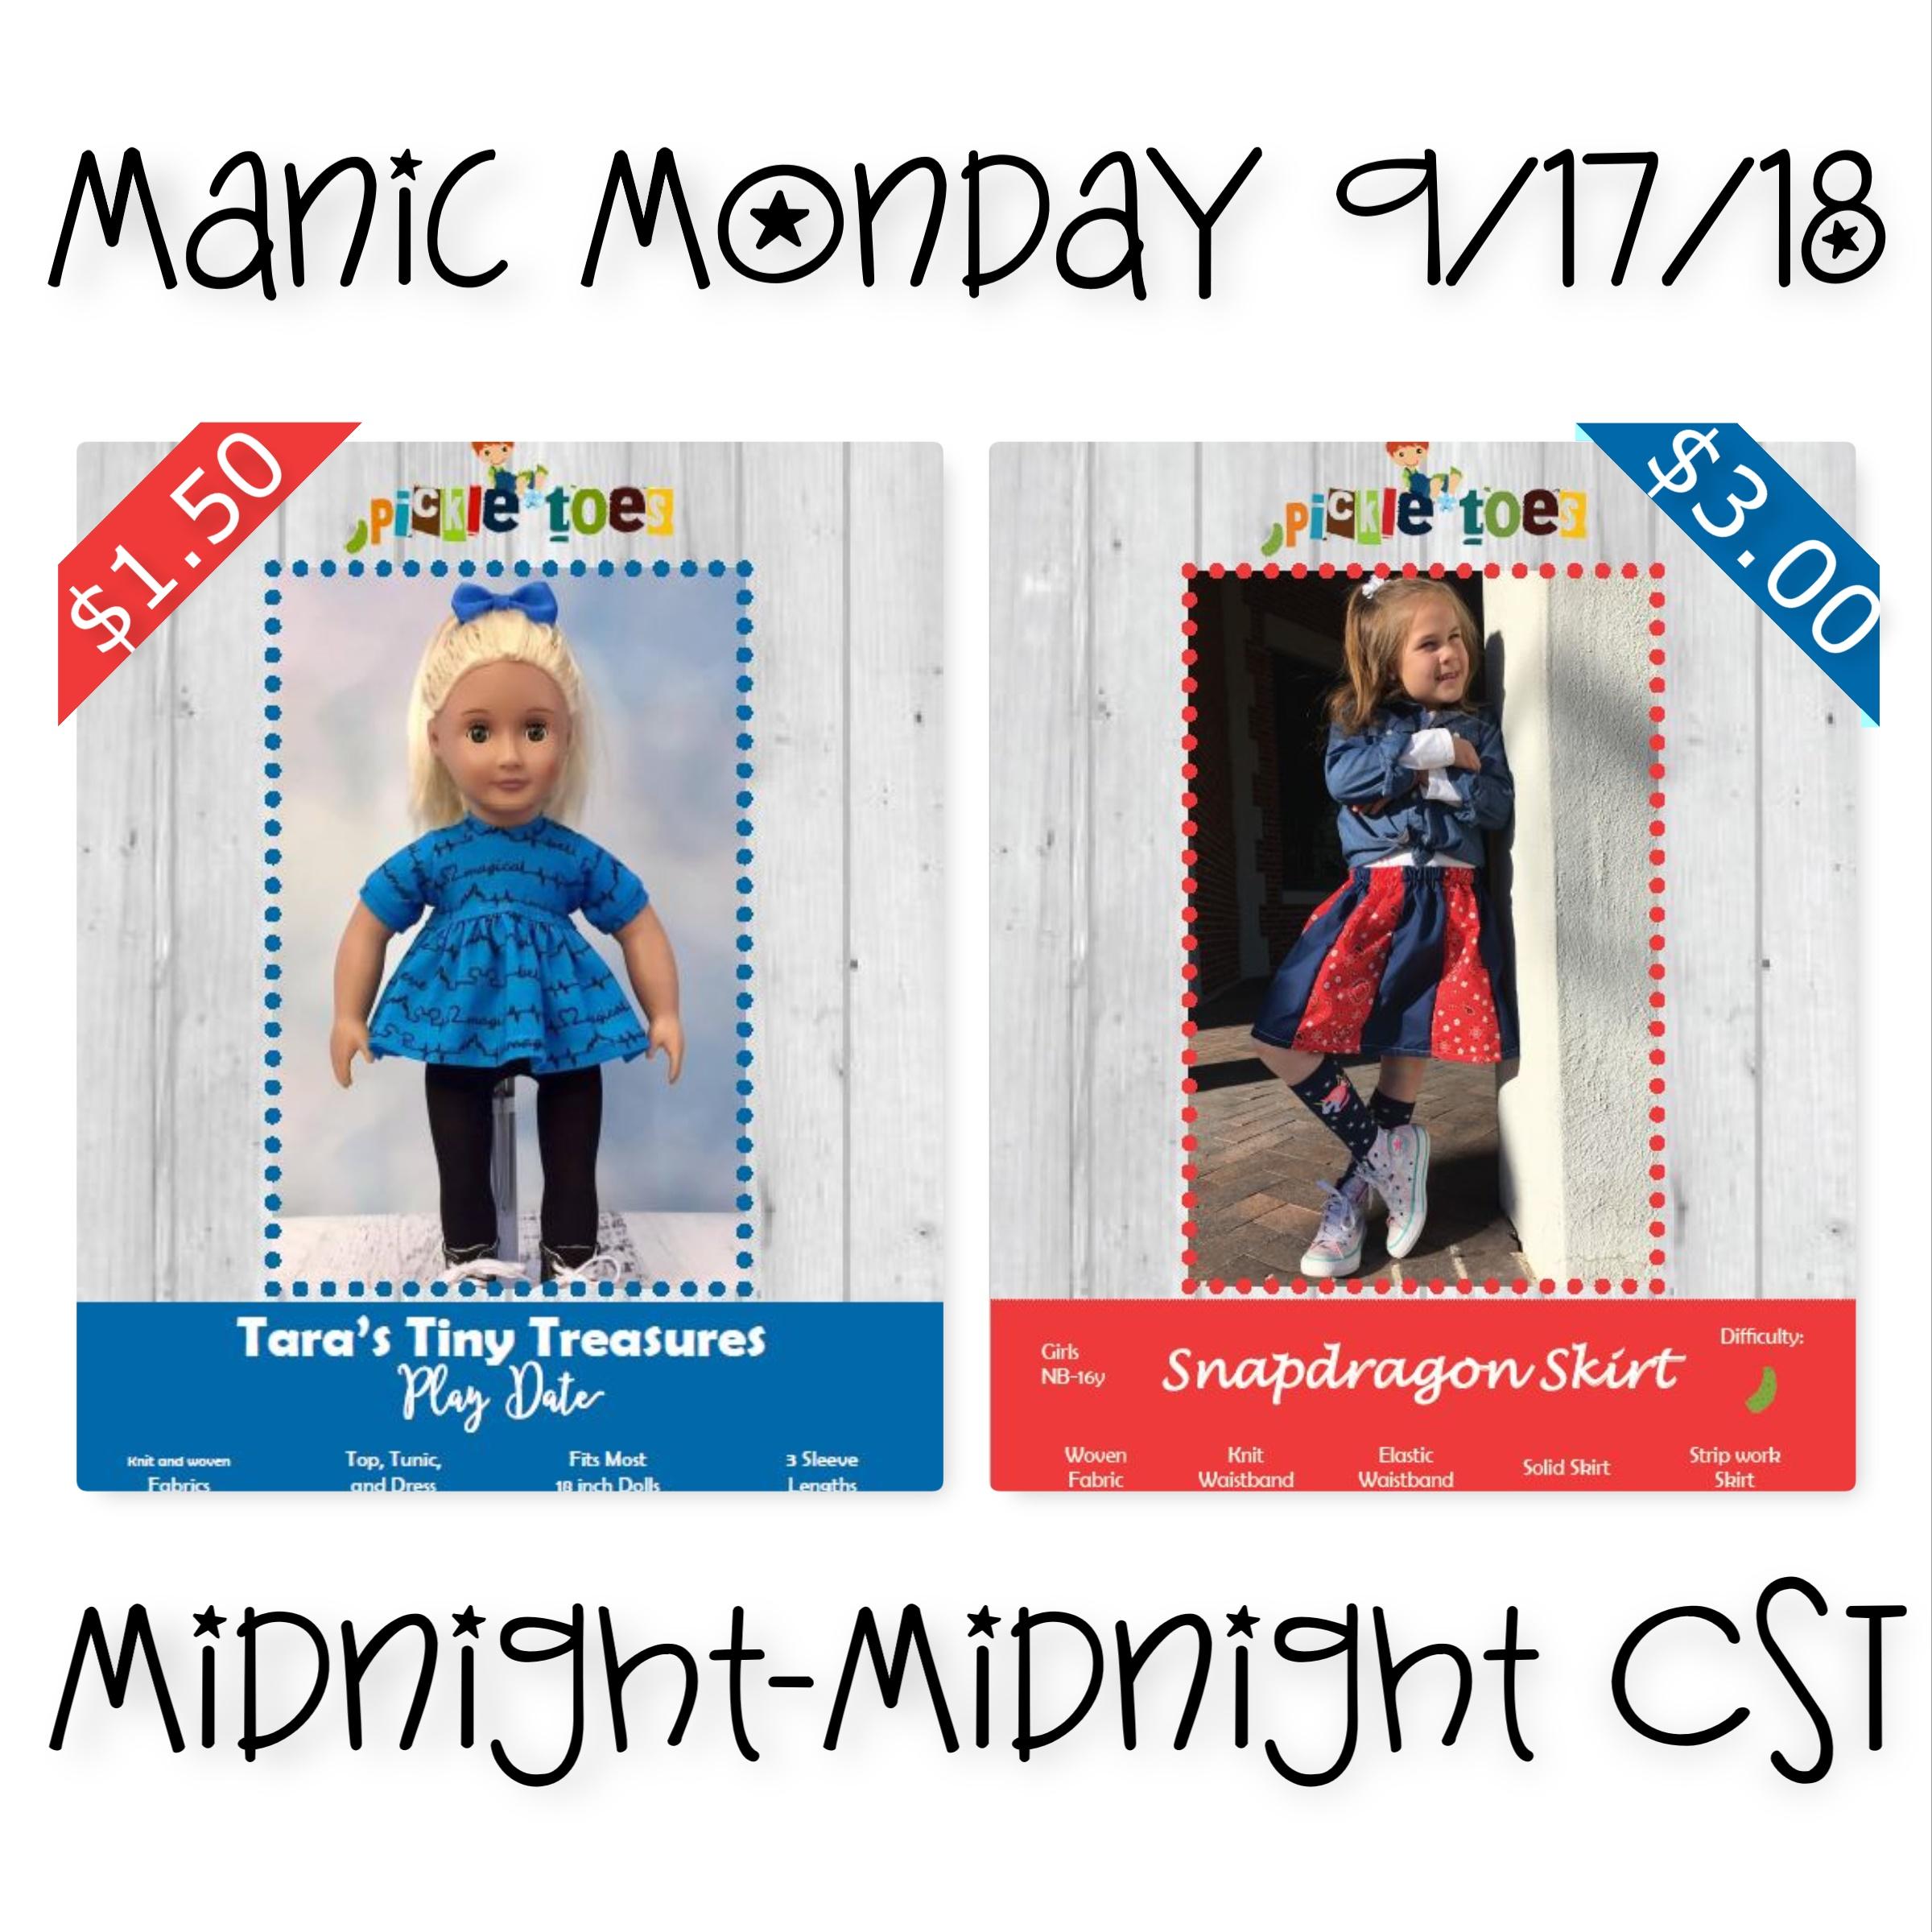 Manic Monday Sewing Pattern Deals 9_17